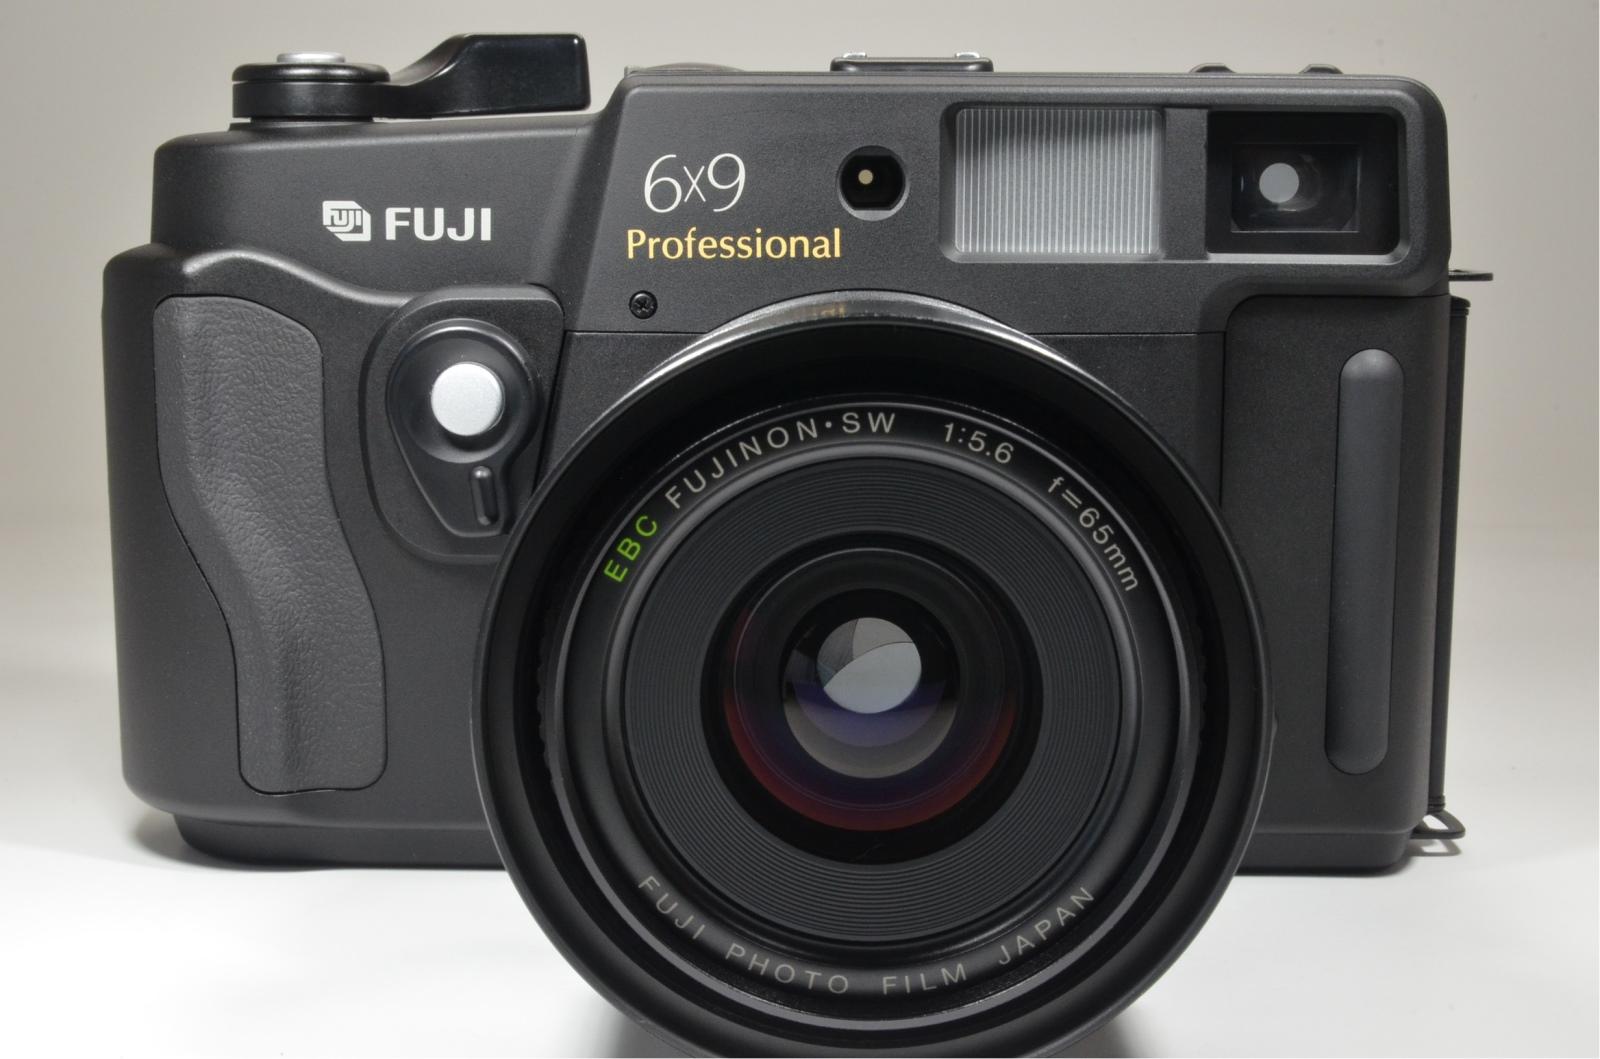 fuji fujifilm gsw690iii 65mm f5.6 count '132' medium format camera